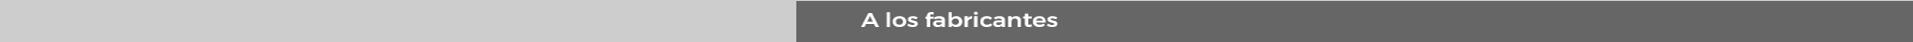 aportamos_banner